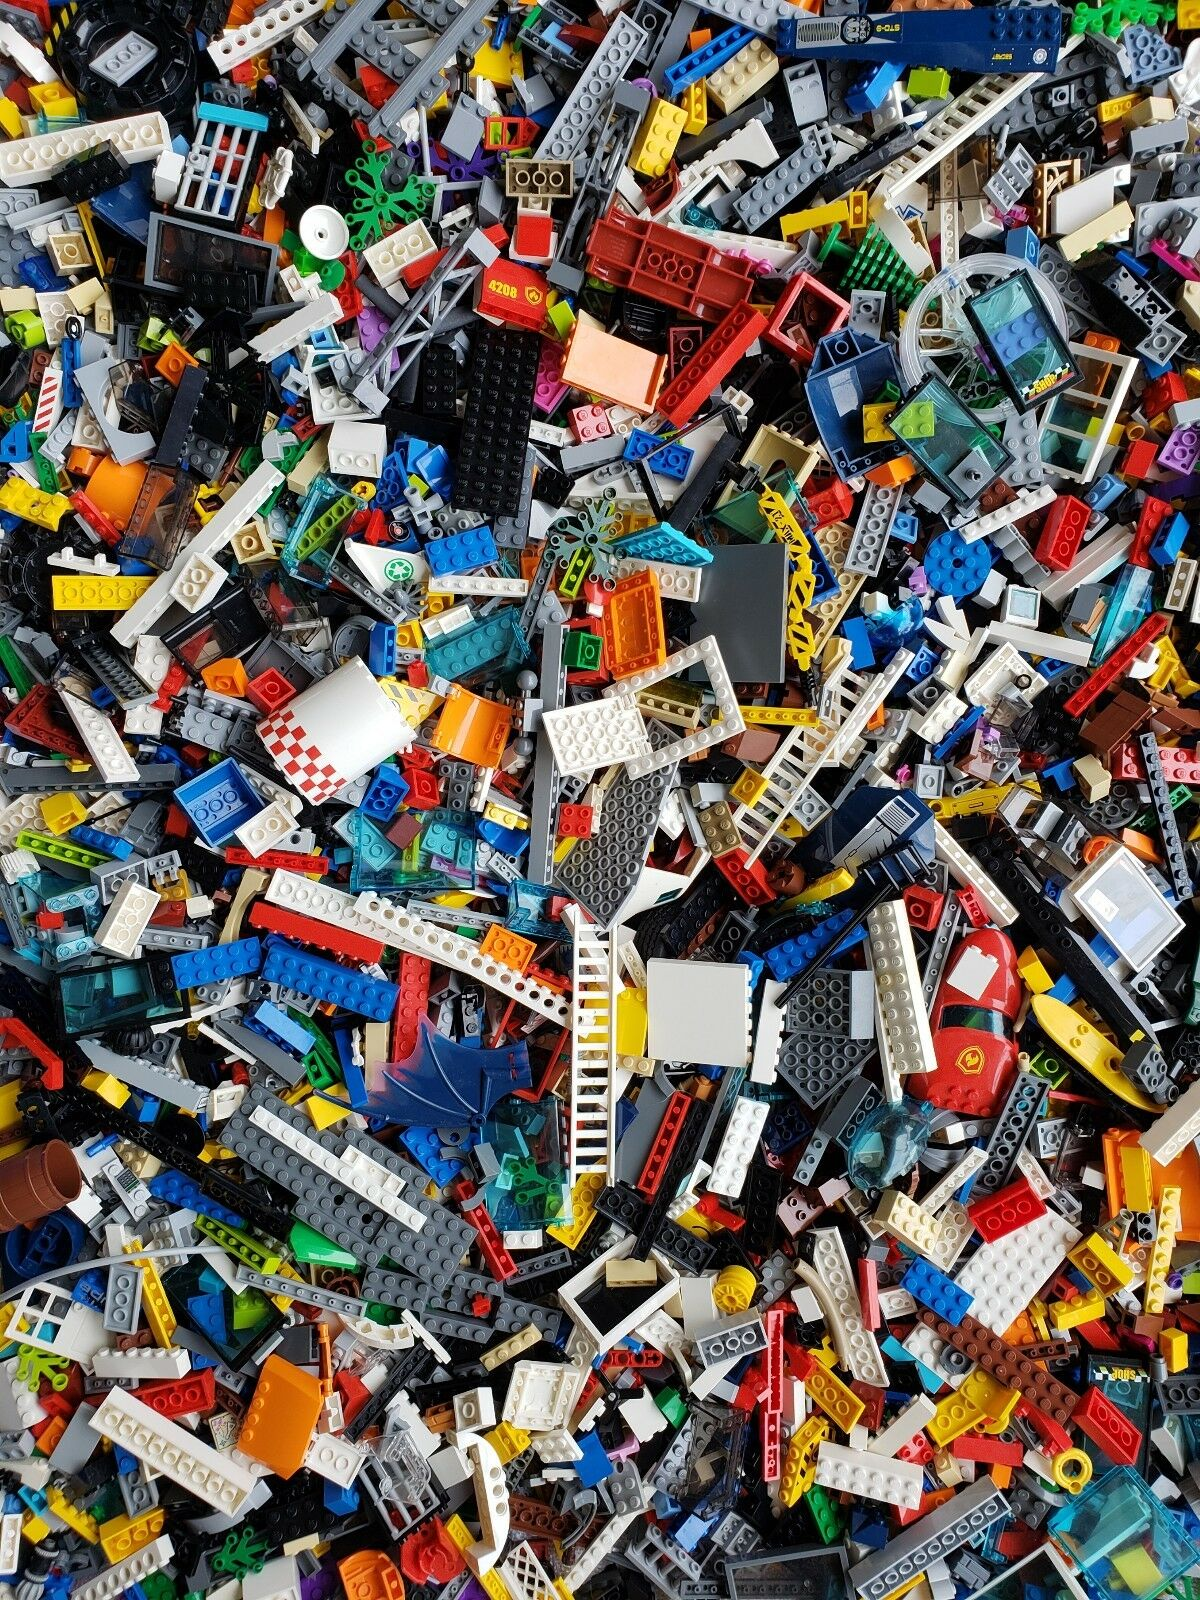 LEGO Lot 8 Pounds Bulk Lot w/ Mini -Figures Cleaned 100% Genuine & Guaranteed